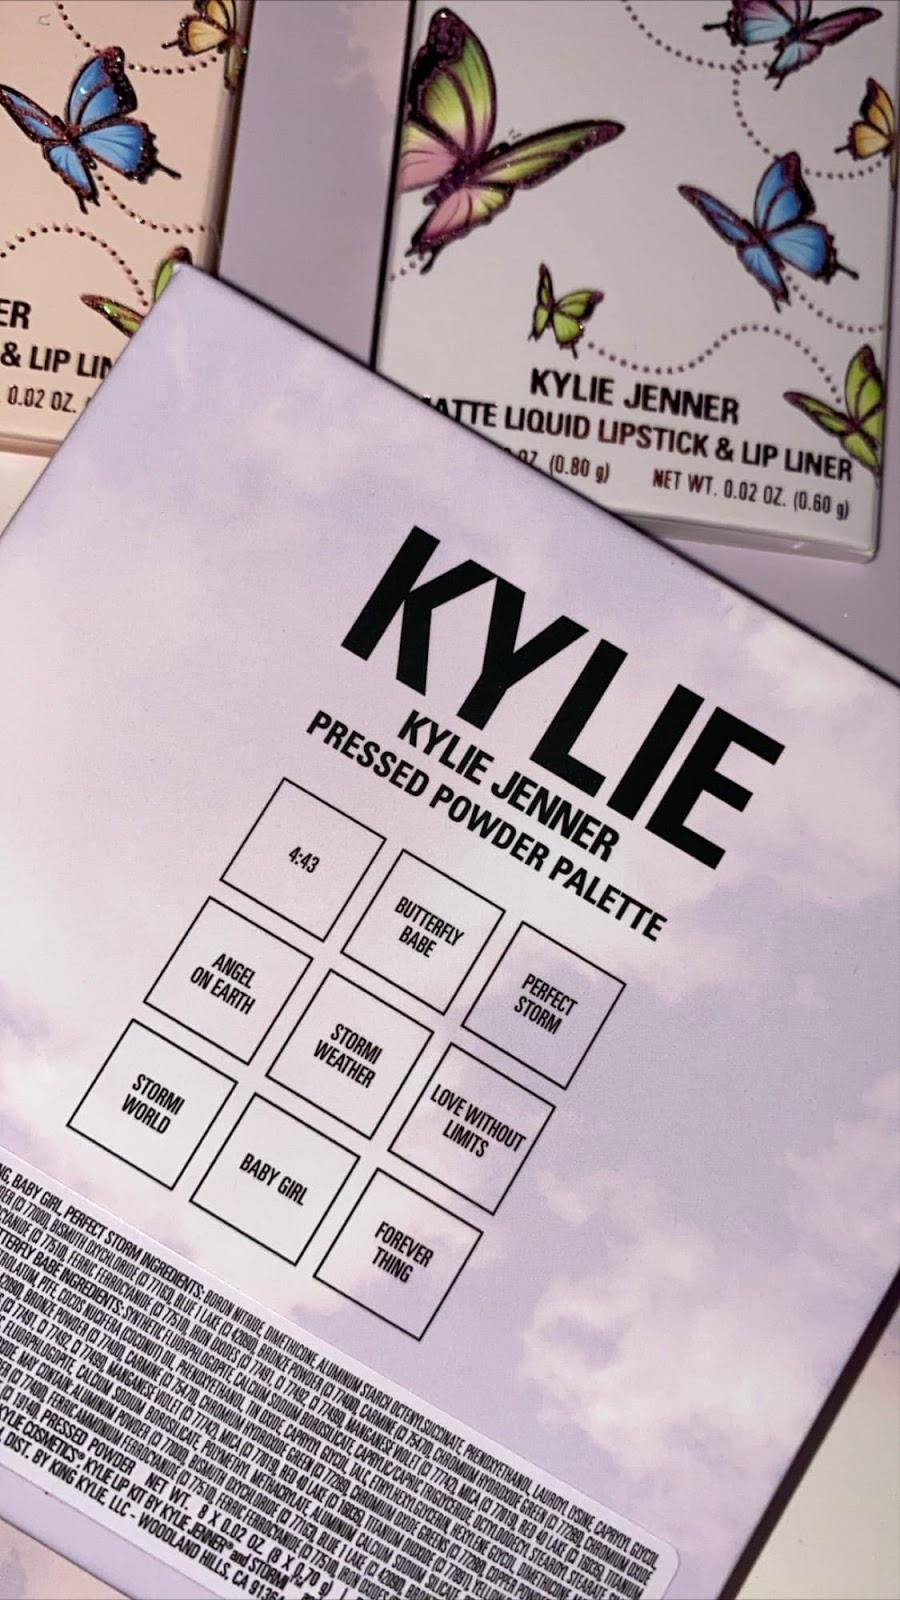 Kylie Jenner x Stormi Makeup Collection 2020